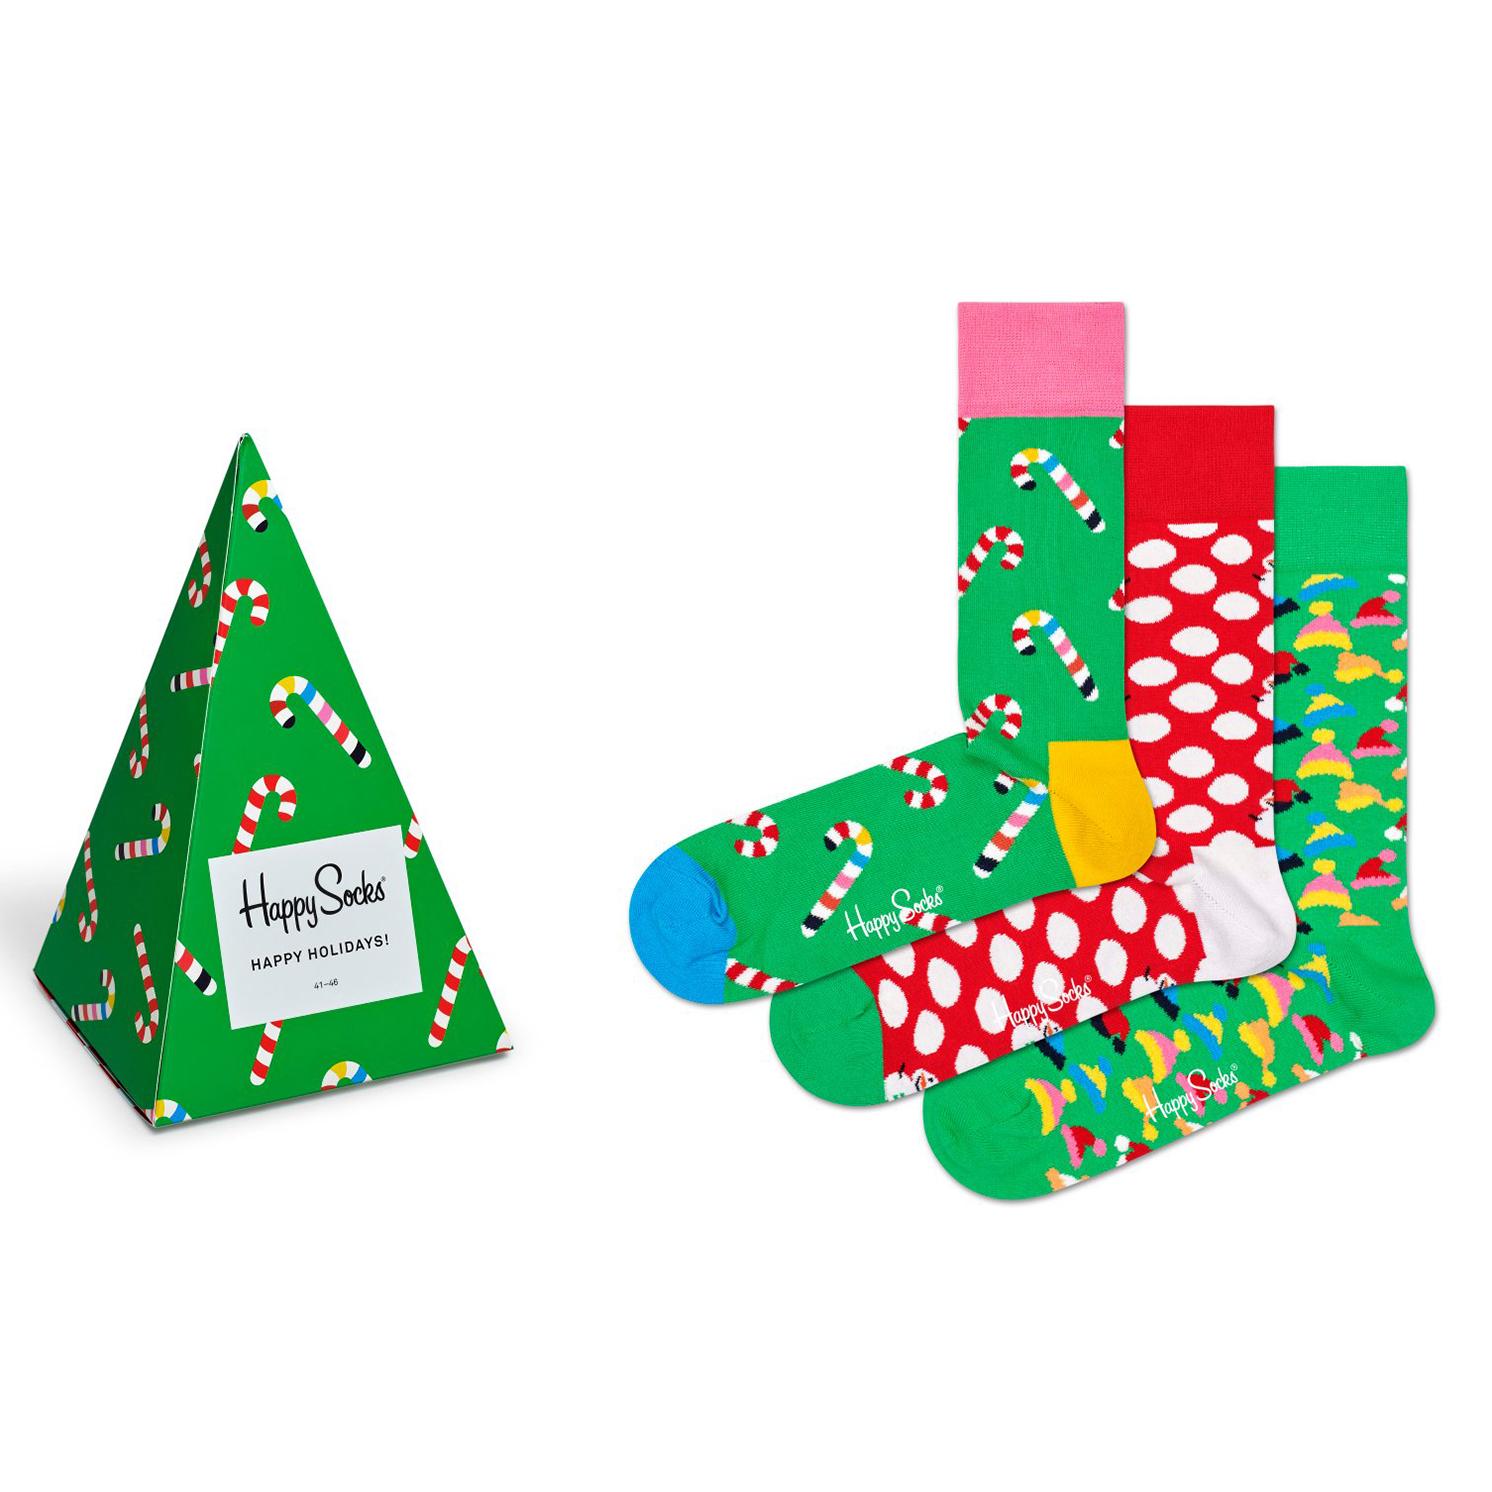 Happy Socks – Set of 3 Pairs of Happy Holiday Socks in Christmas Tree Gift Box